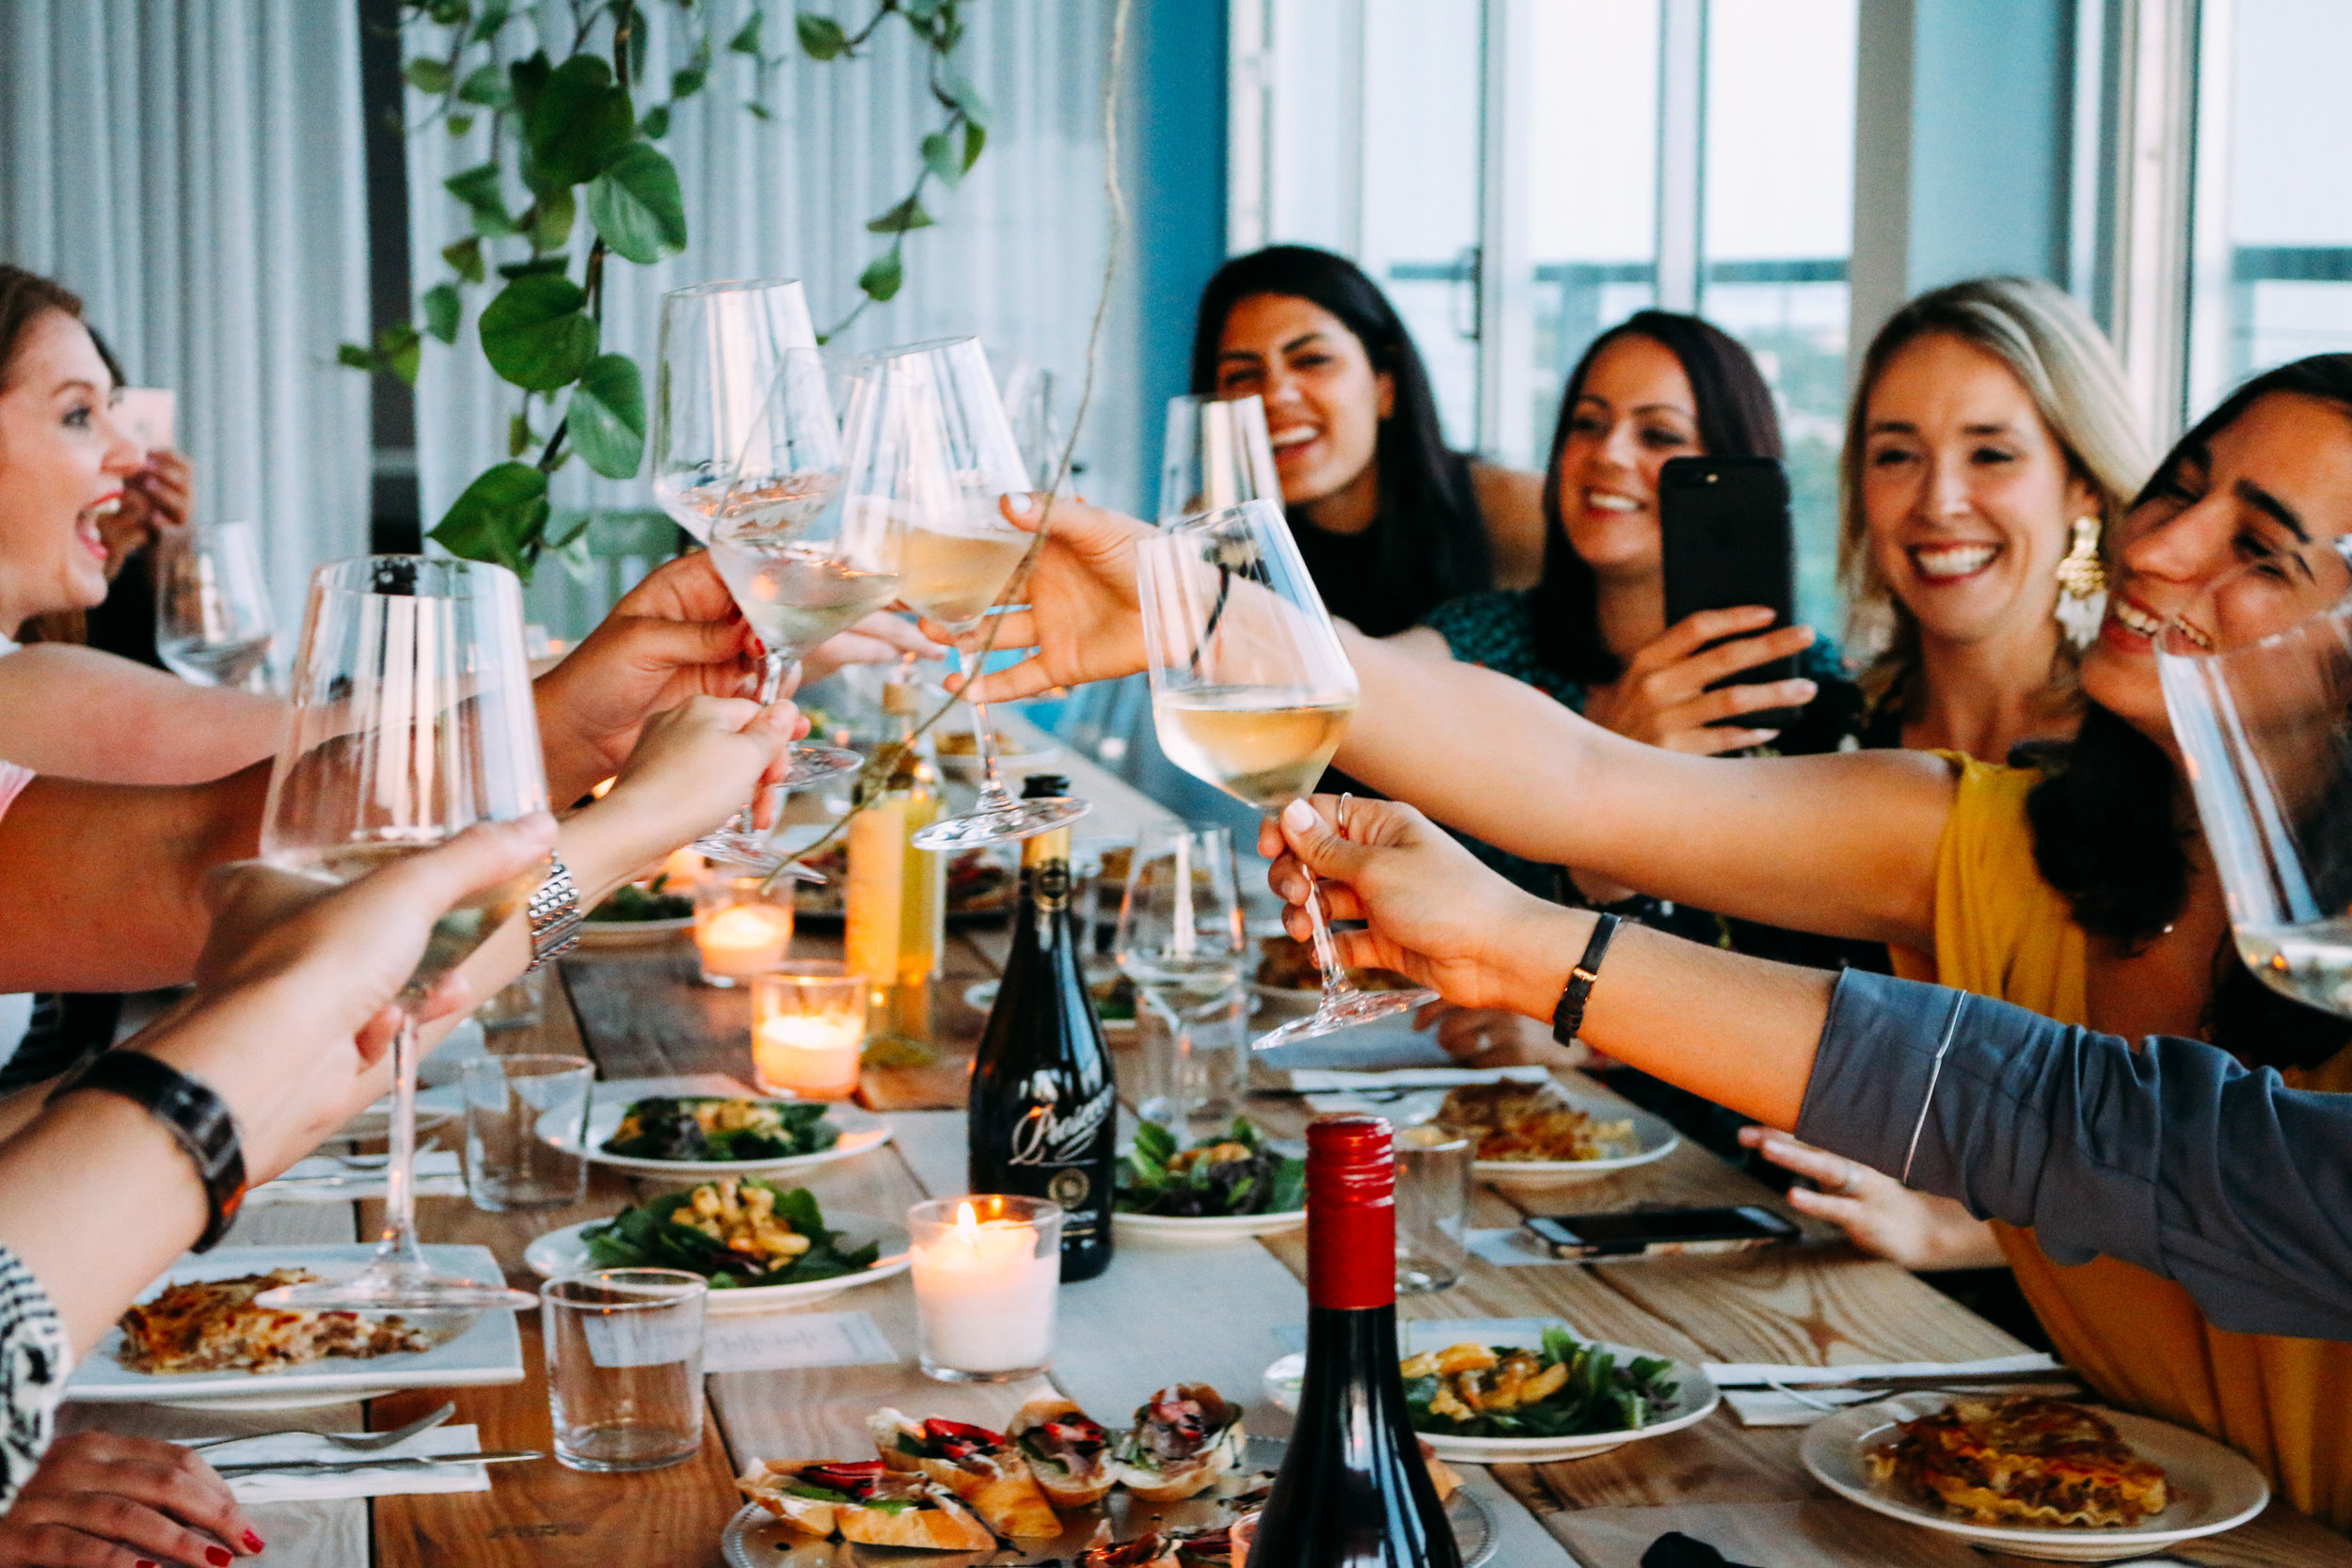 Women Who Wine Uncorked Conversations-Miami Wine Events-Wine Tasting Miami-54.jpg